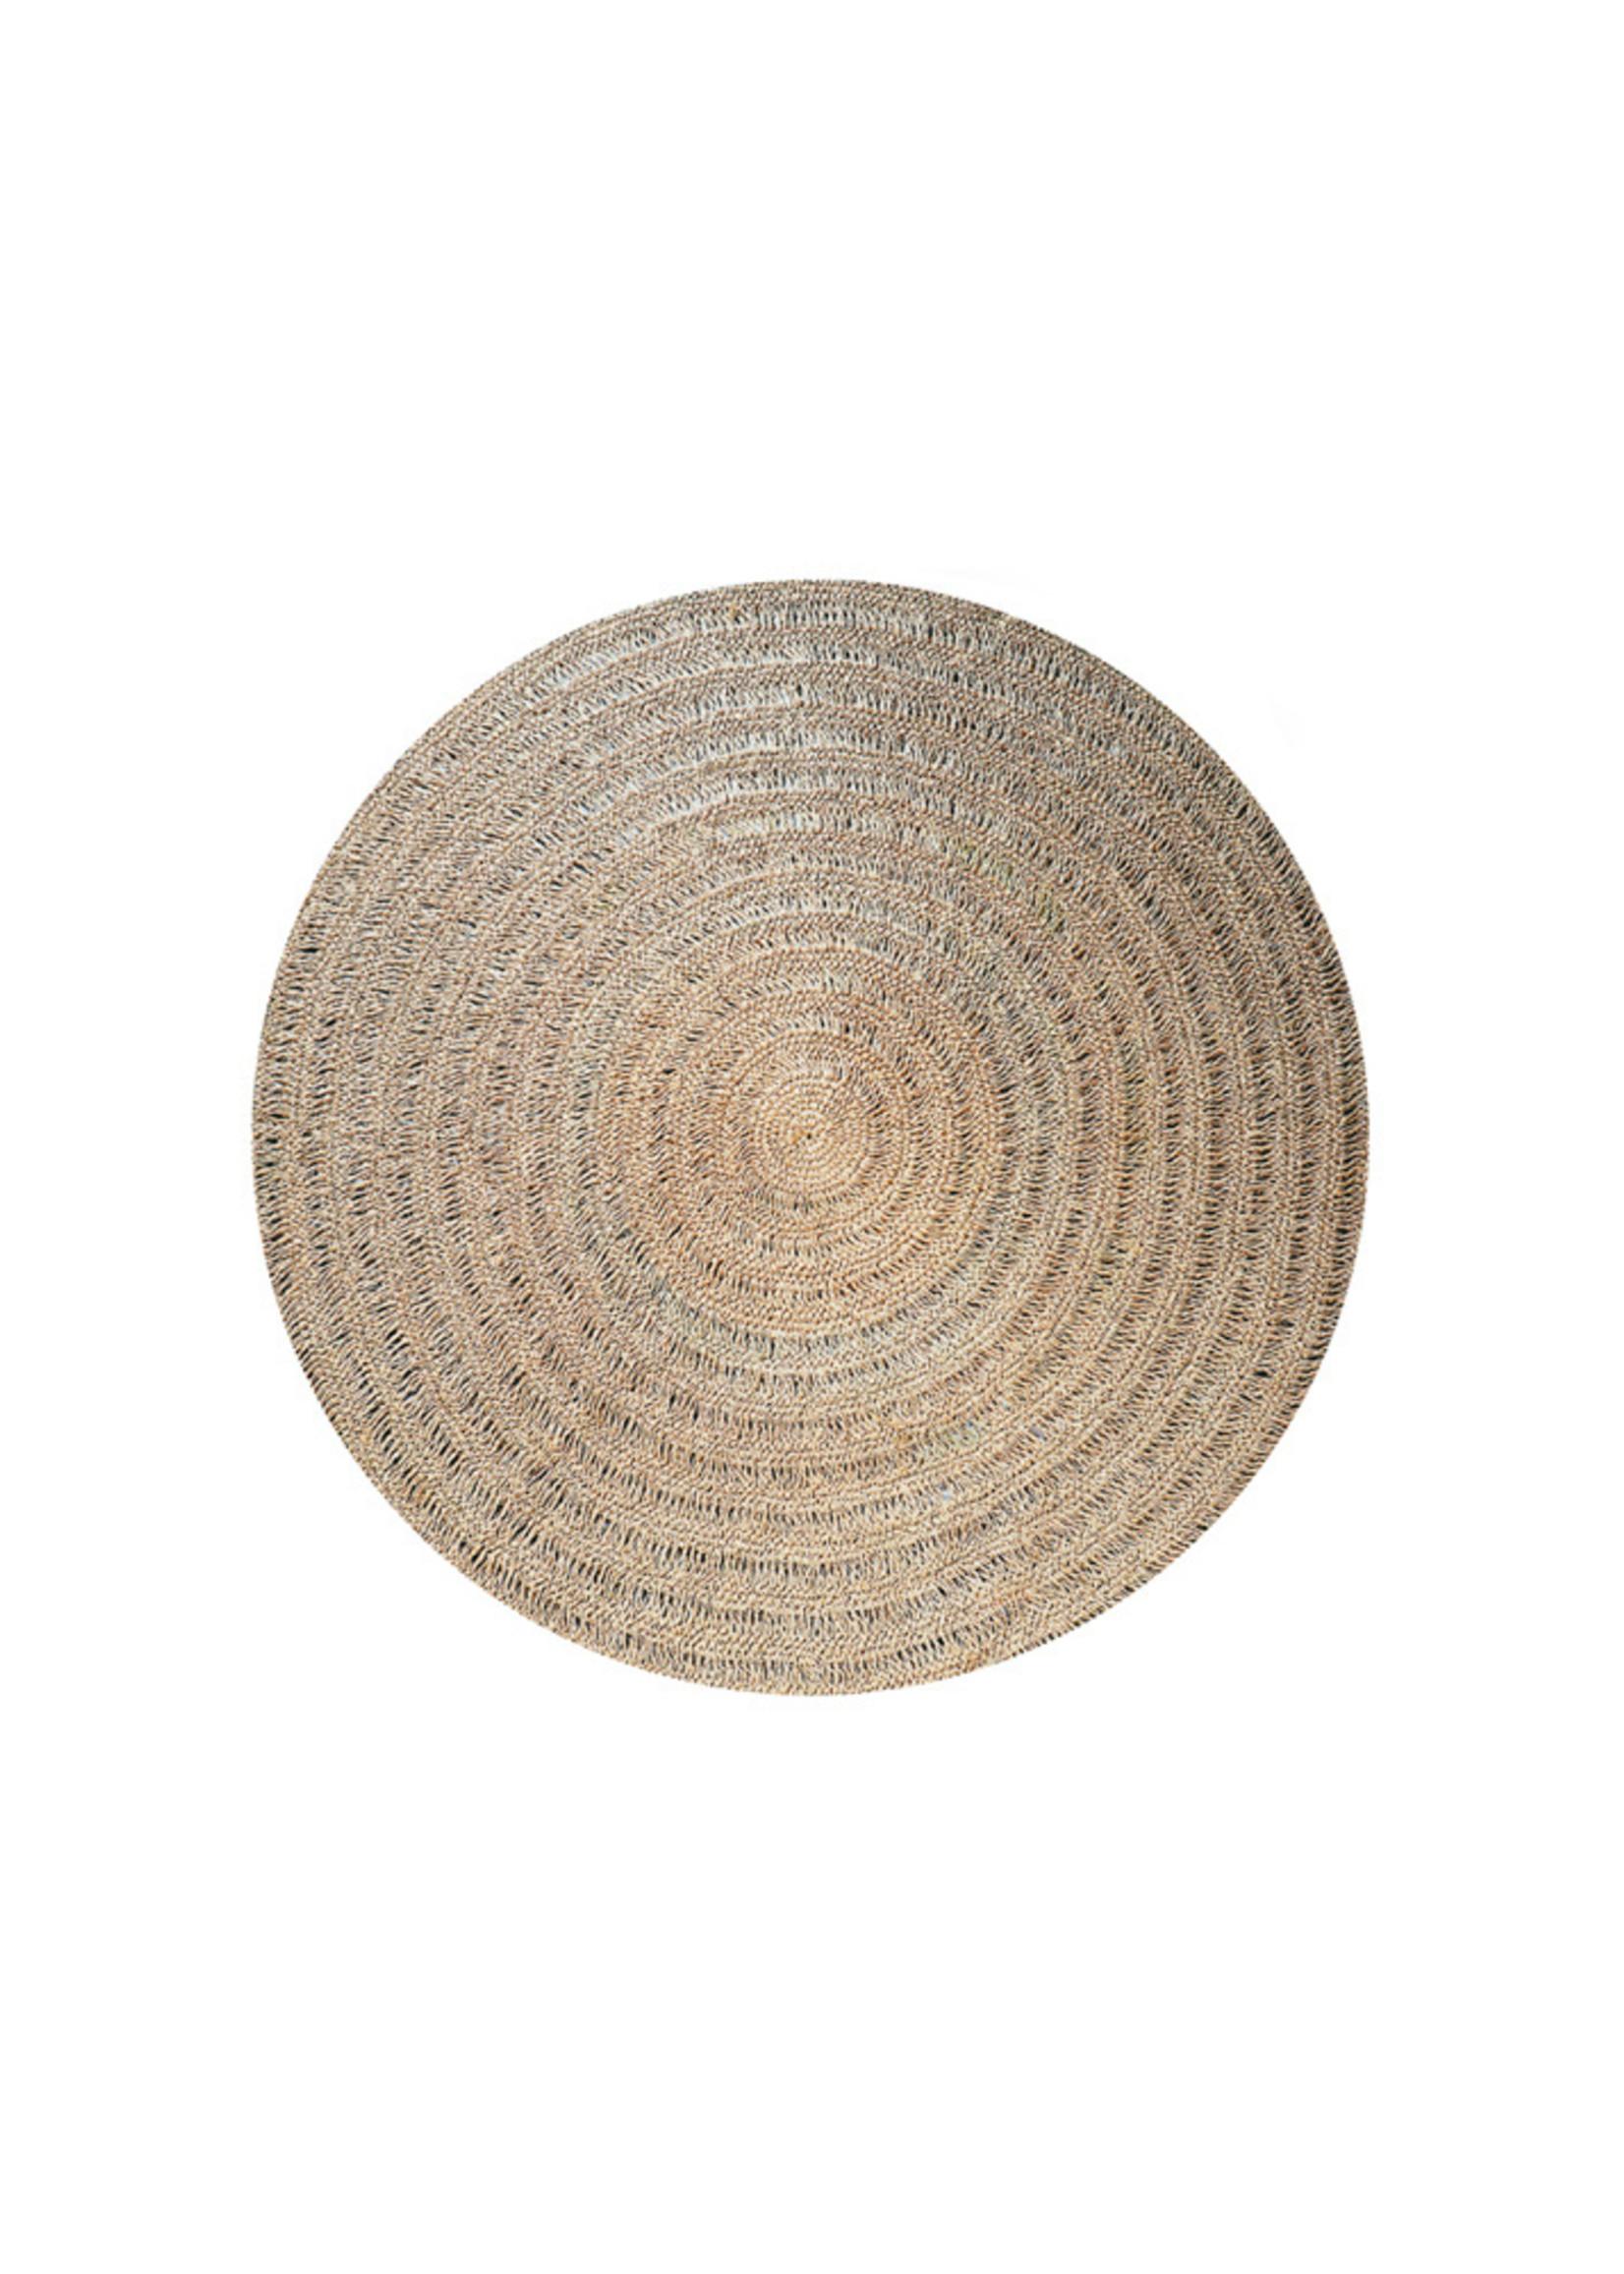 The Seagrass Carpet - Natural - 100cm